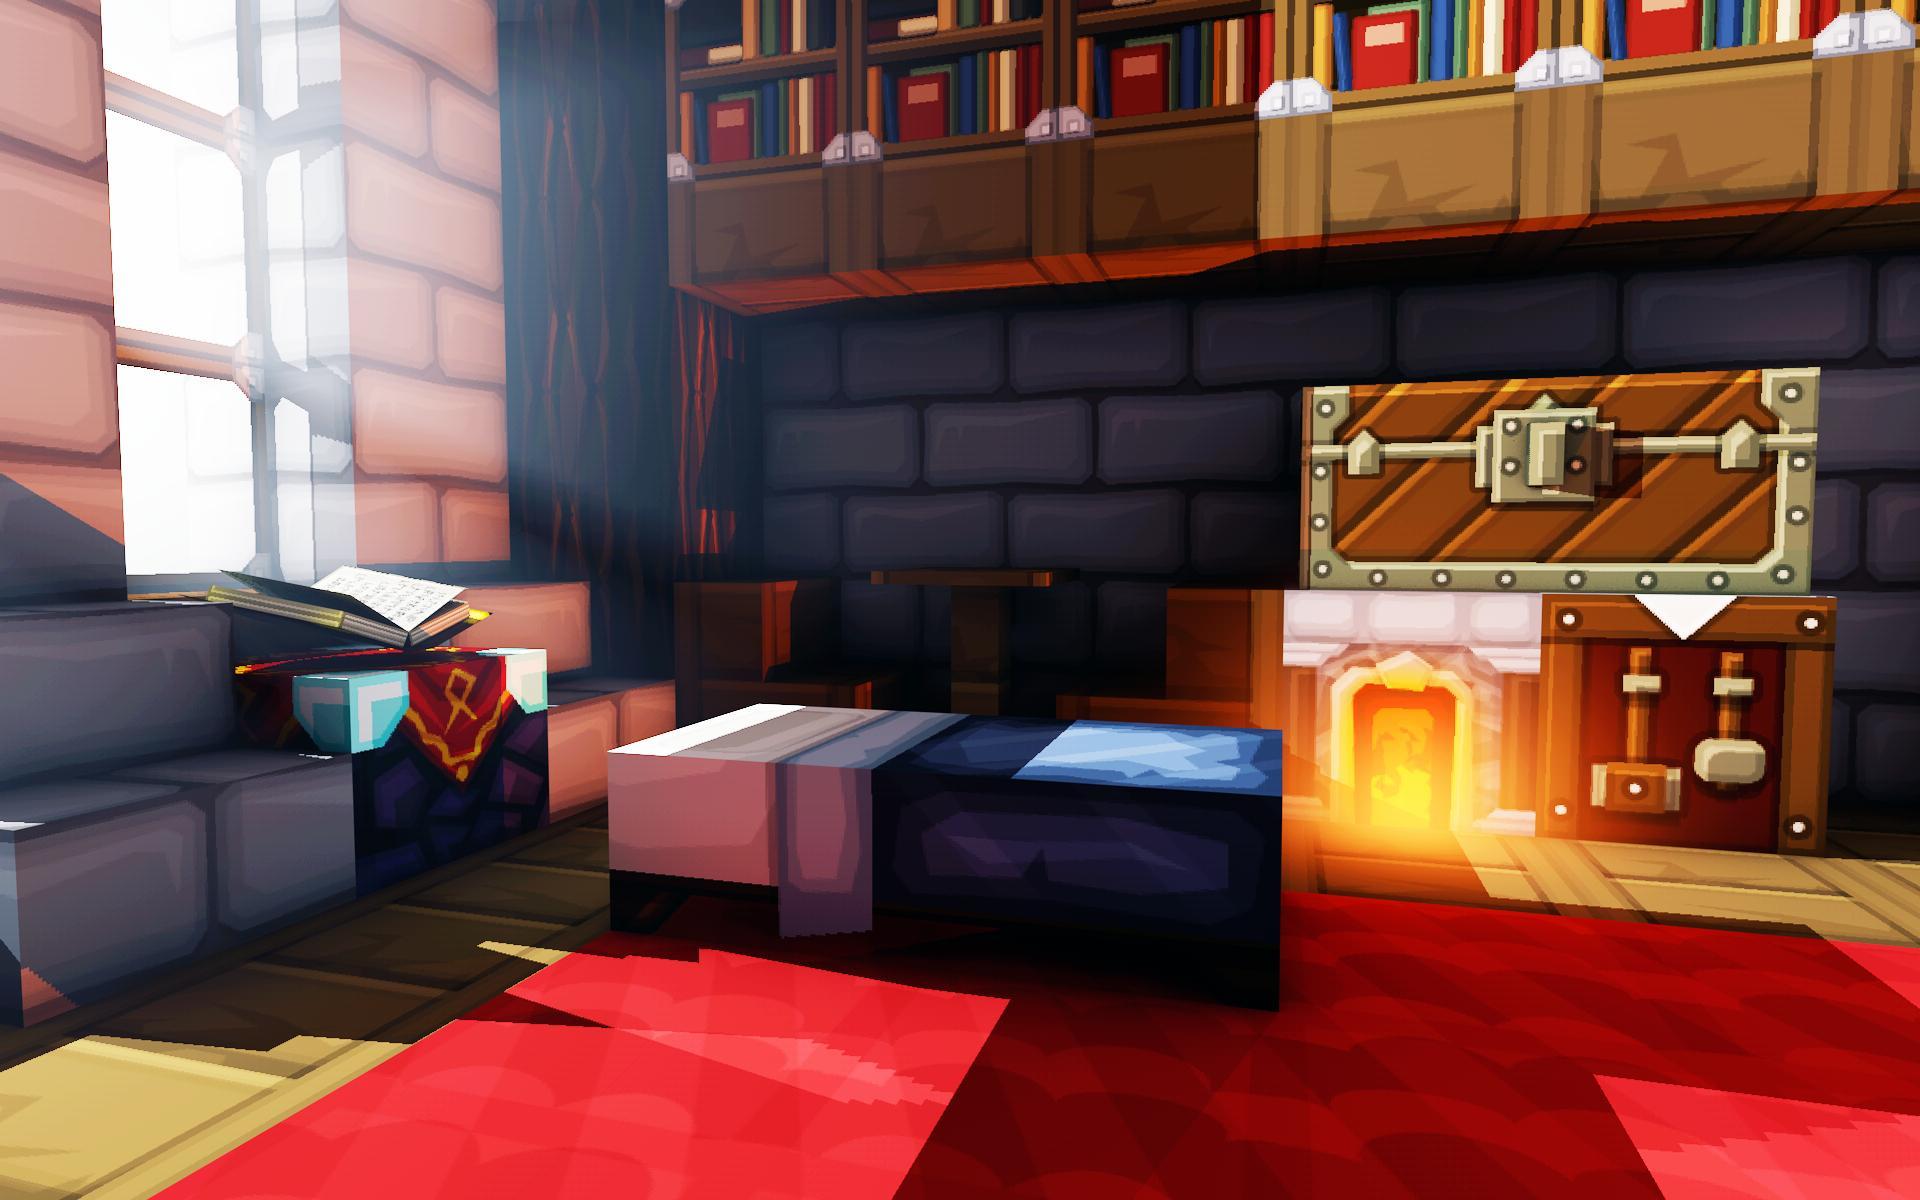 minecraft room wallpaper,room,furniture,interior design,living room,bedroom